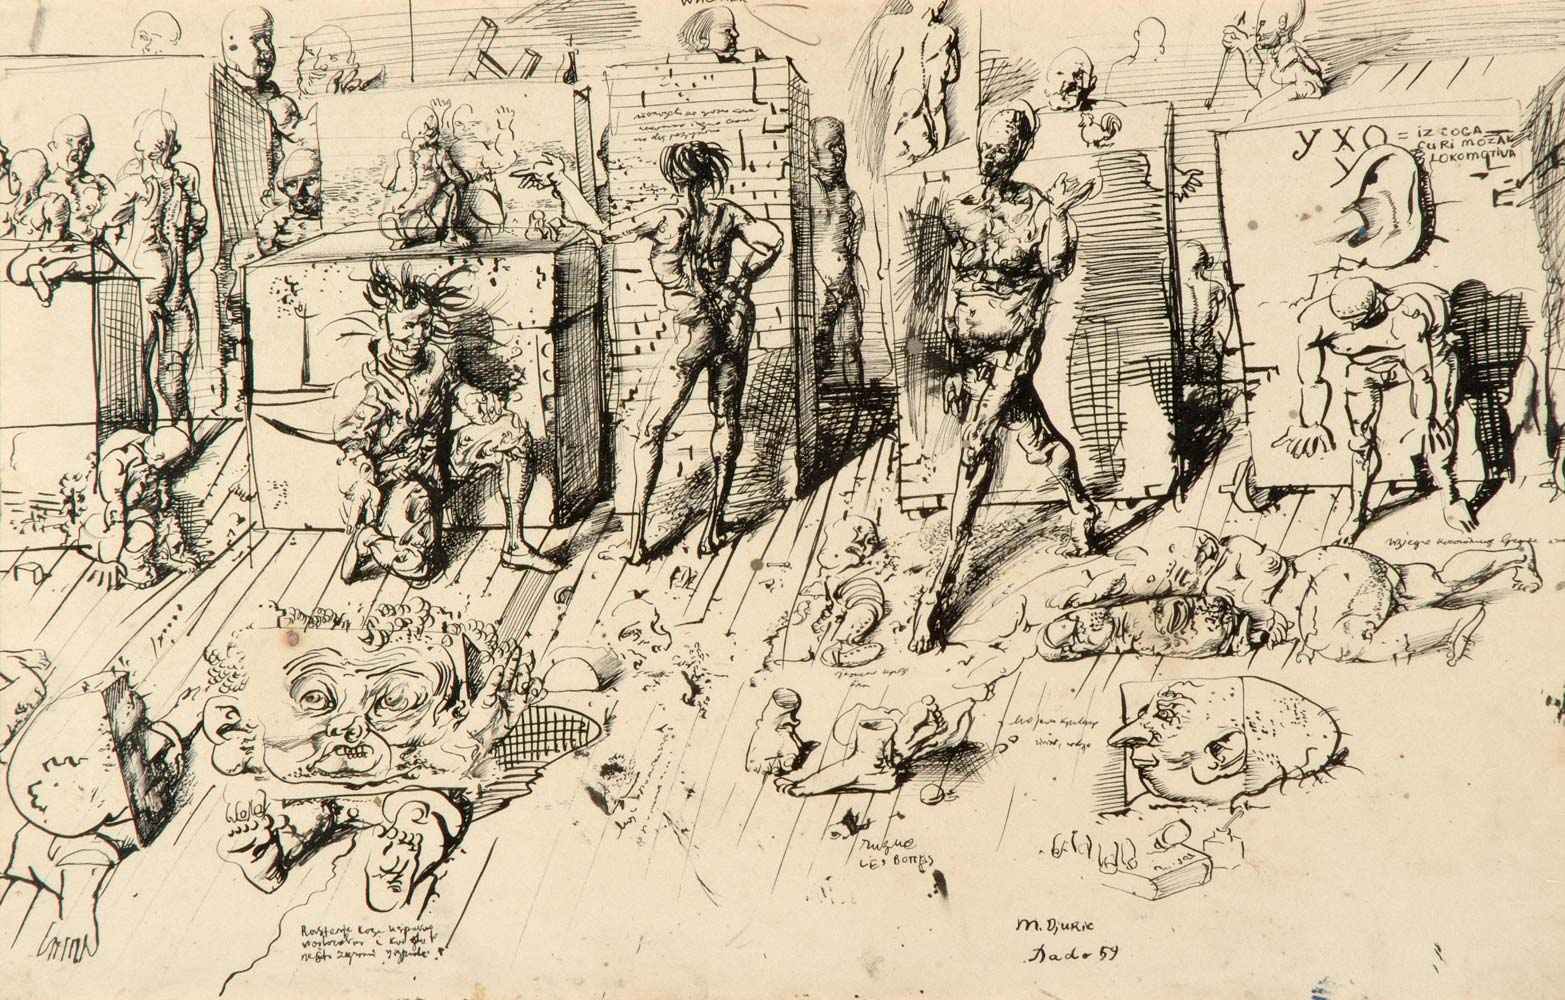 Dado's drawing: The Studio, 1959